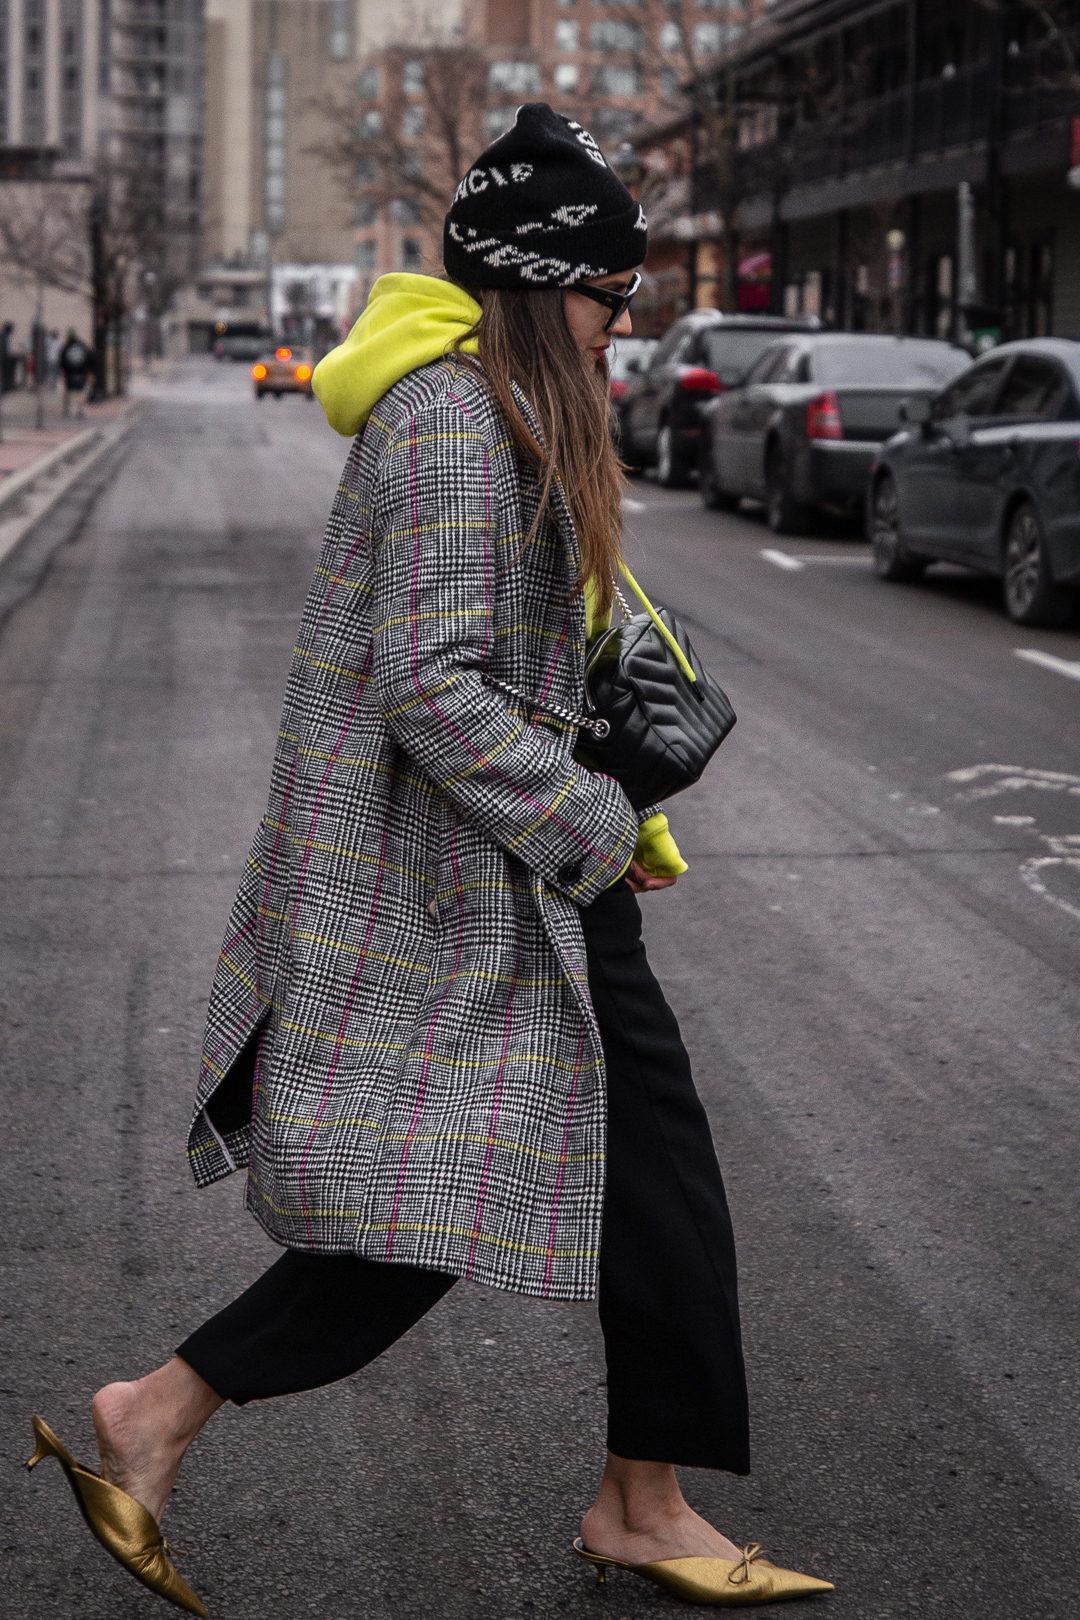 Nathalie Martin - Balenciaga logo beanie hat, Saint Laurent LouLou small bowling bag, Zara neon yellow hoodie, Aritzia Jallade black high waisted pant, Balenciaga bronze leather Knife mules, Dior club 2 sunglasses, street style - WOAHSTYLE.com_5366.jpg